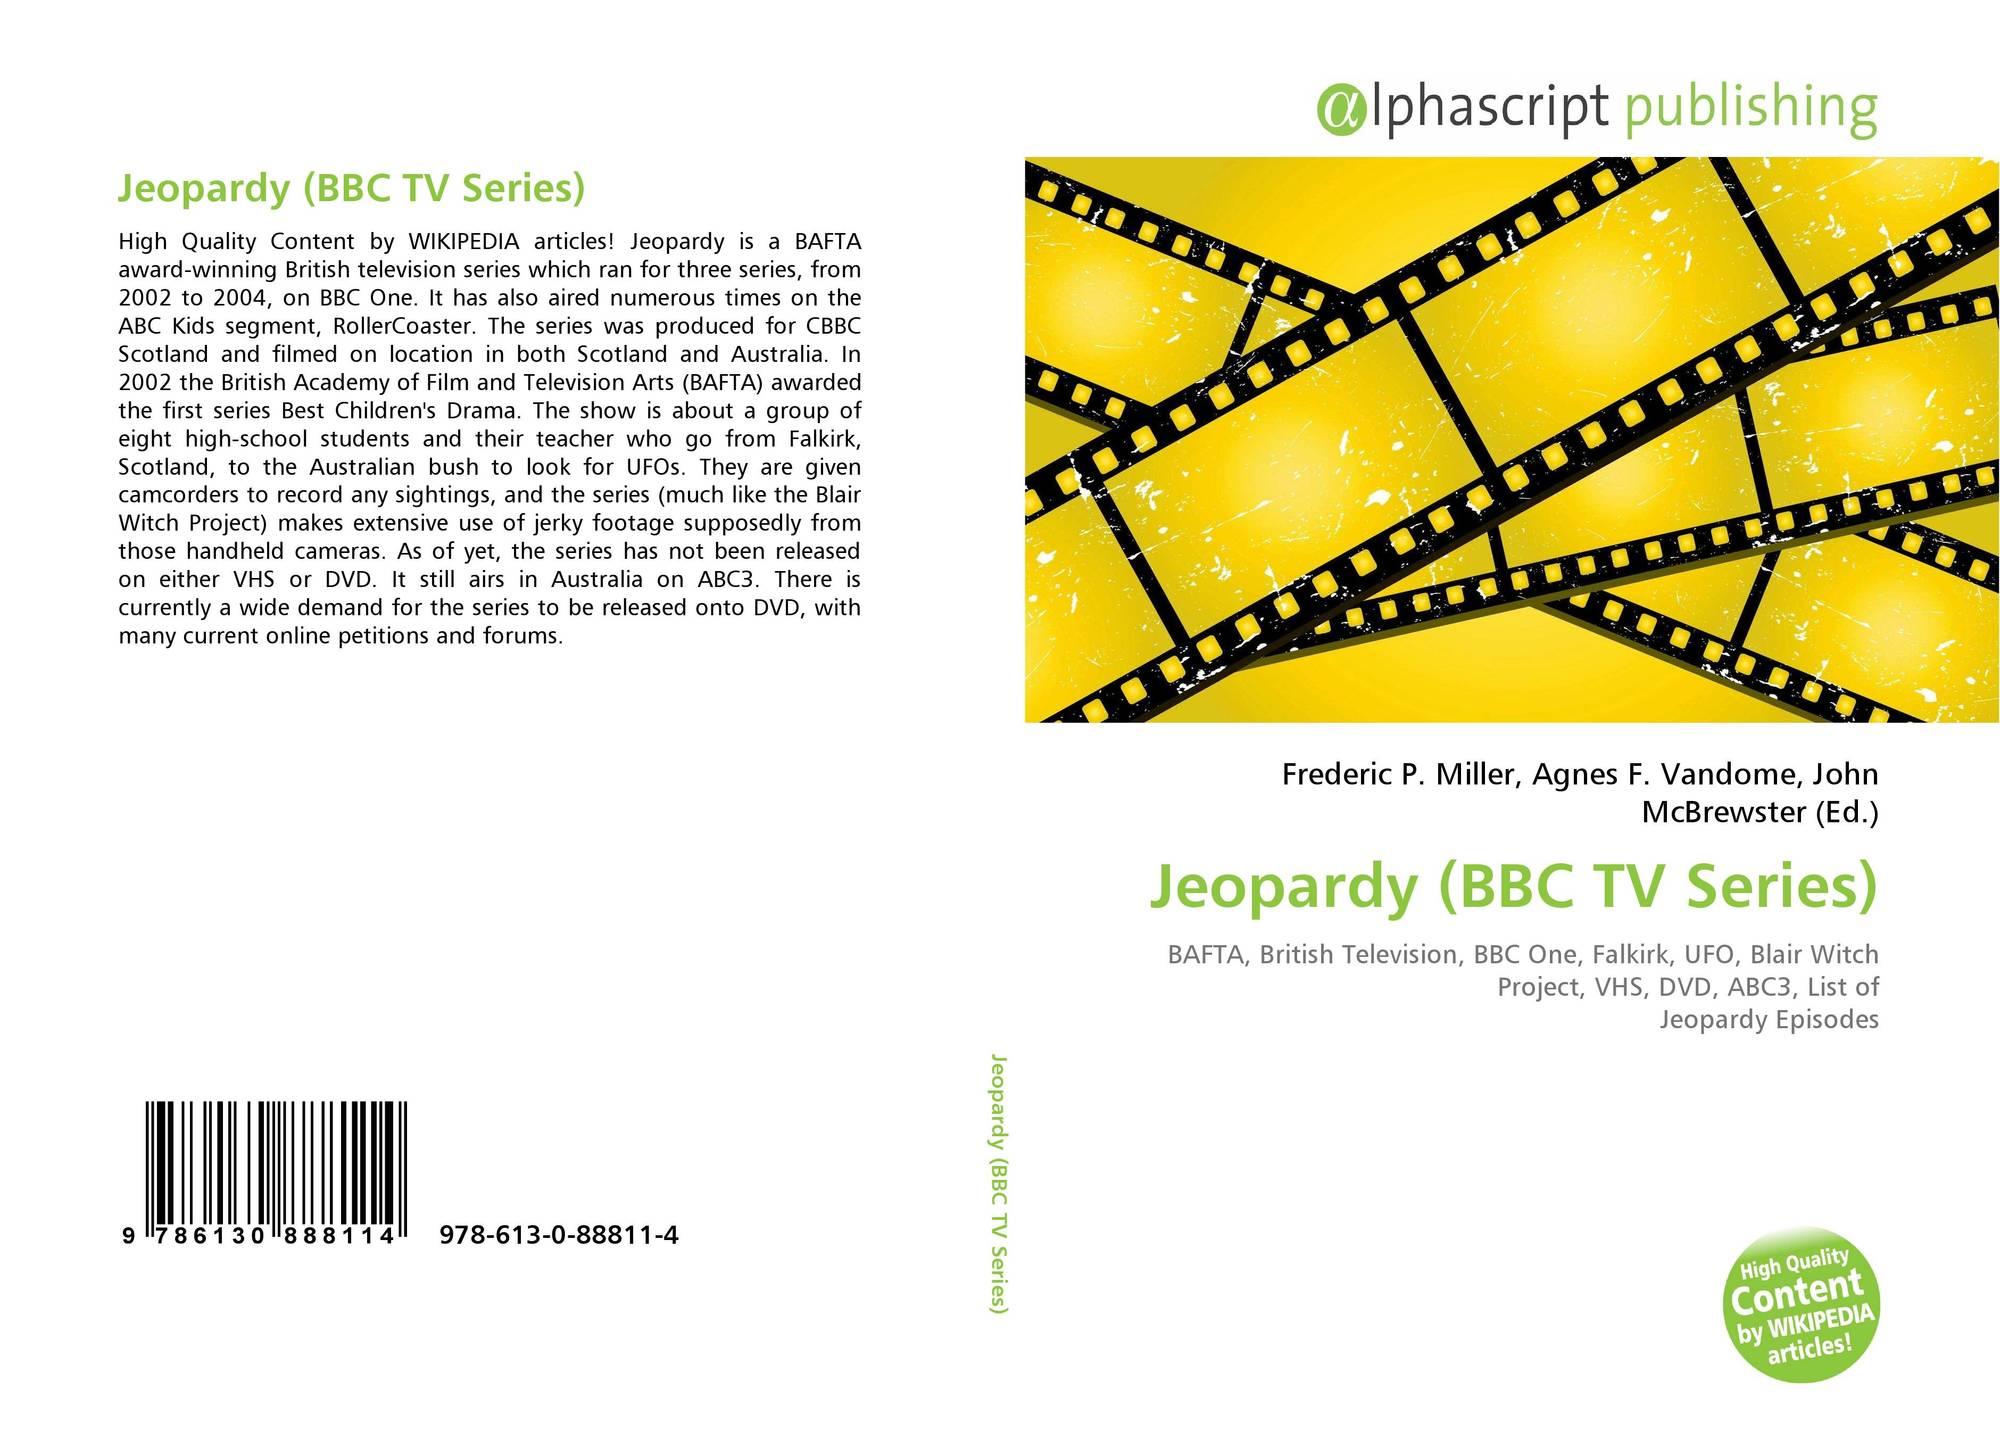 Jeopardy (BBC TV Series), 978-613-0-88811-4, 6130888112